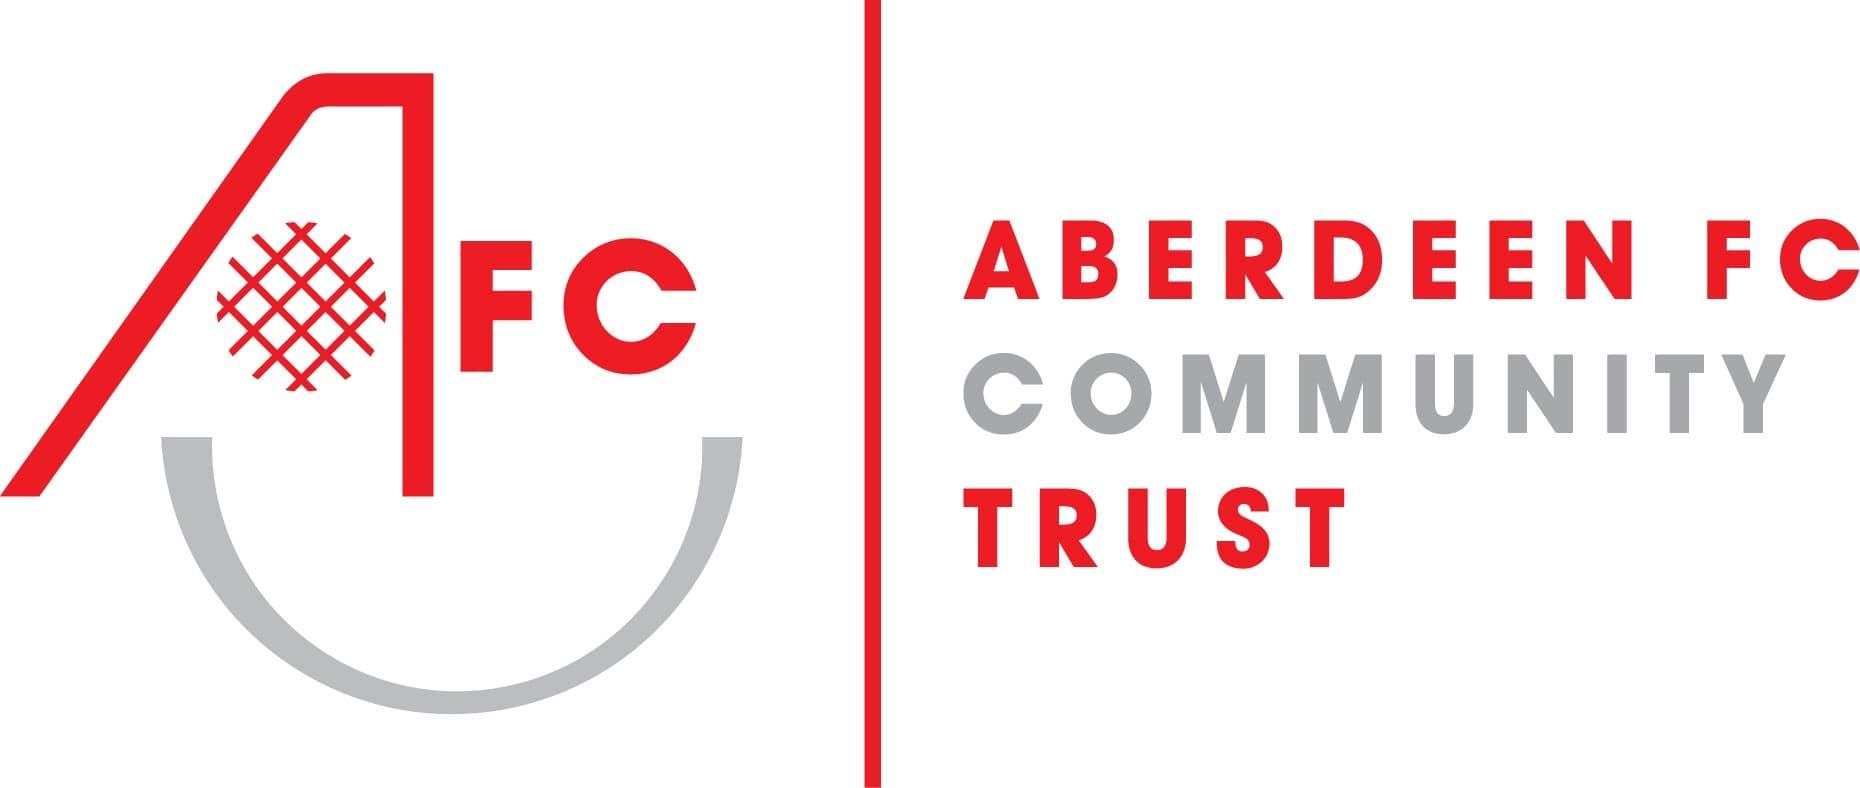 Aberdeen FC Community Trust